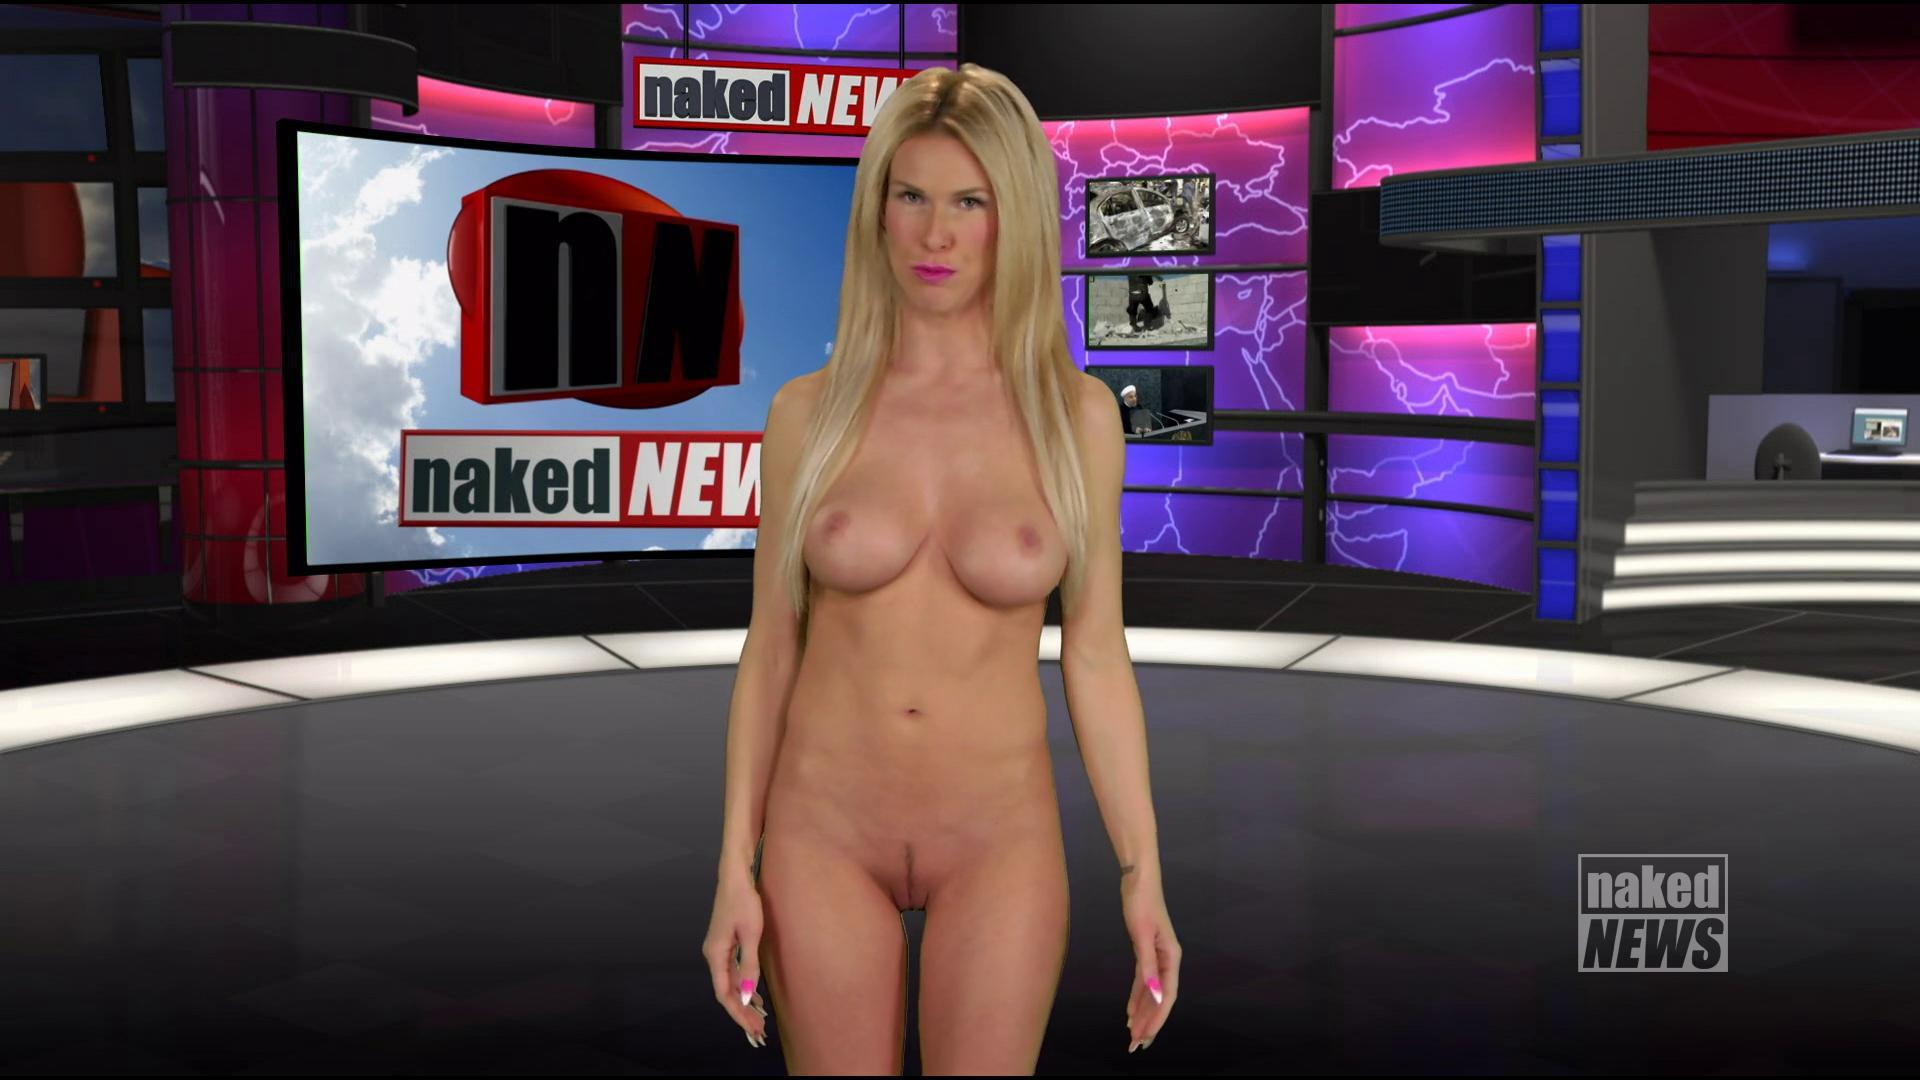 Hot naked news babes — photo 6